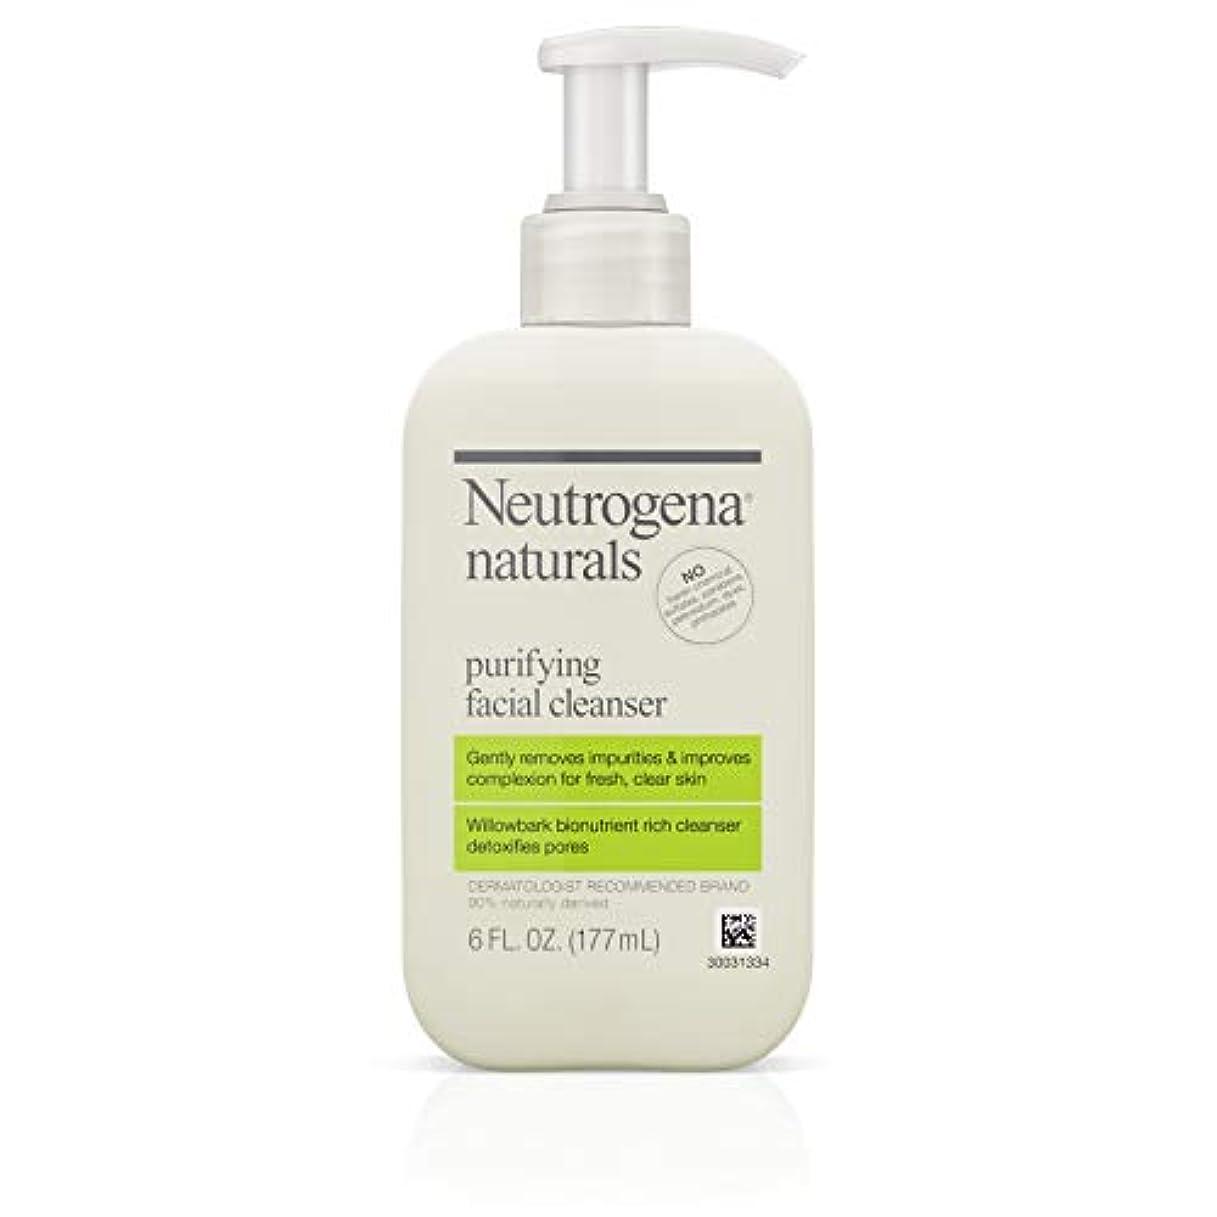 医薬品王子煙突Neutrogena Naturals Purifying Facial Cleanser 175 ml (並行輸入品)